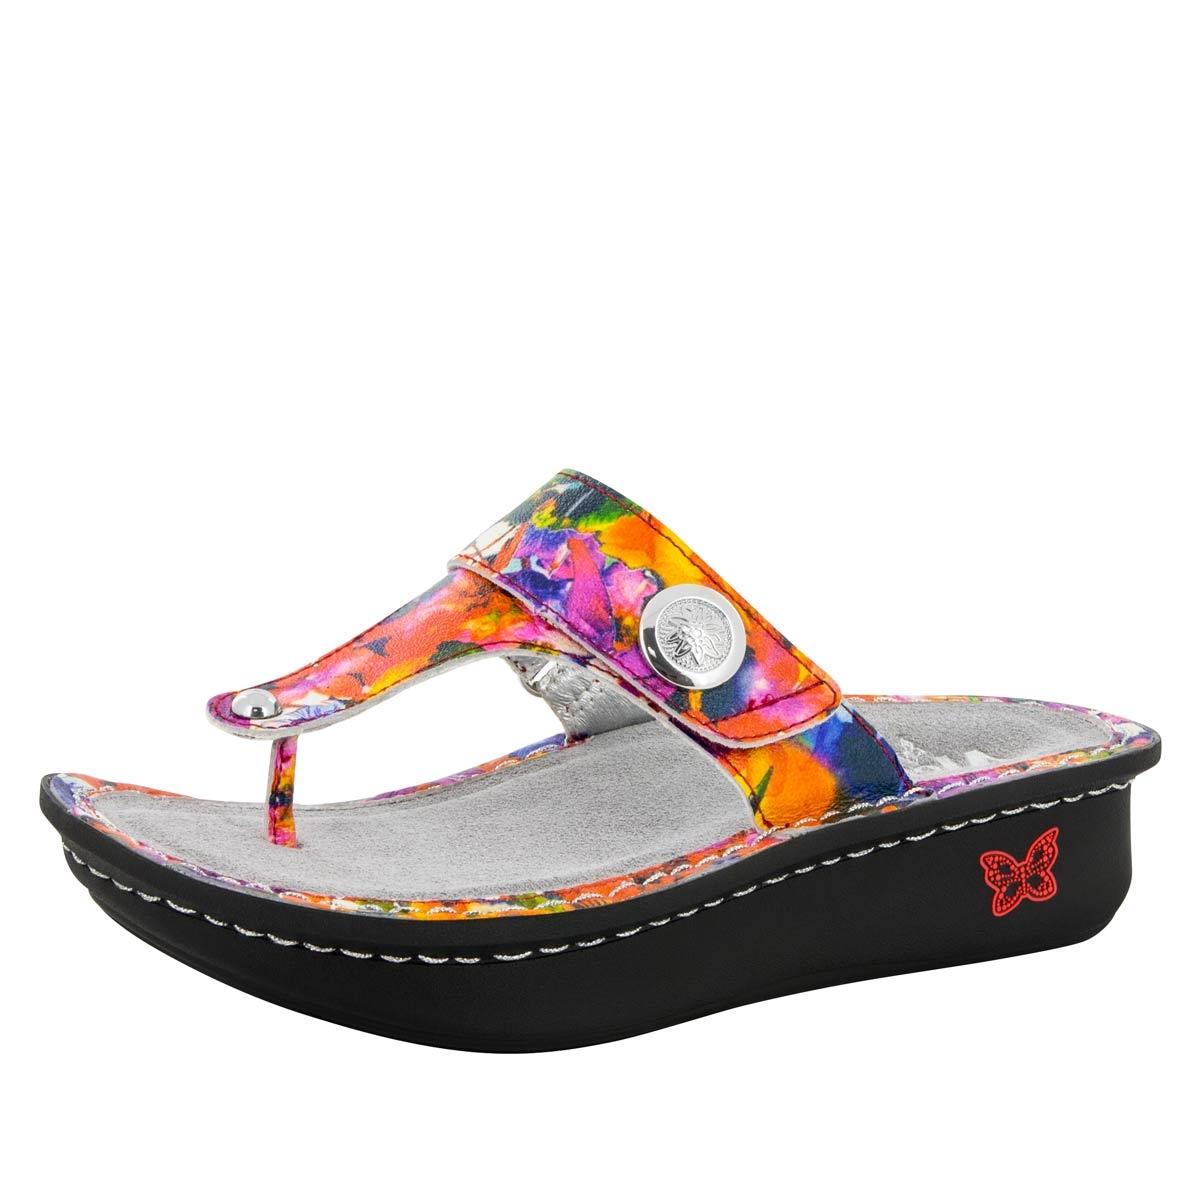 Carina Iris - Alegria Shoes